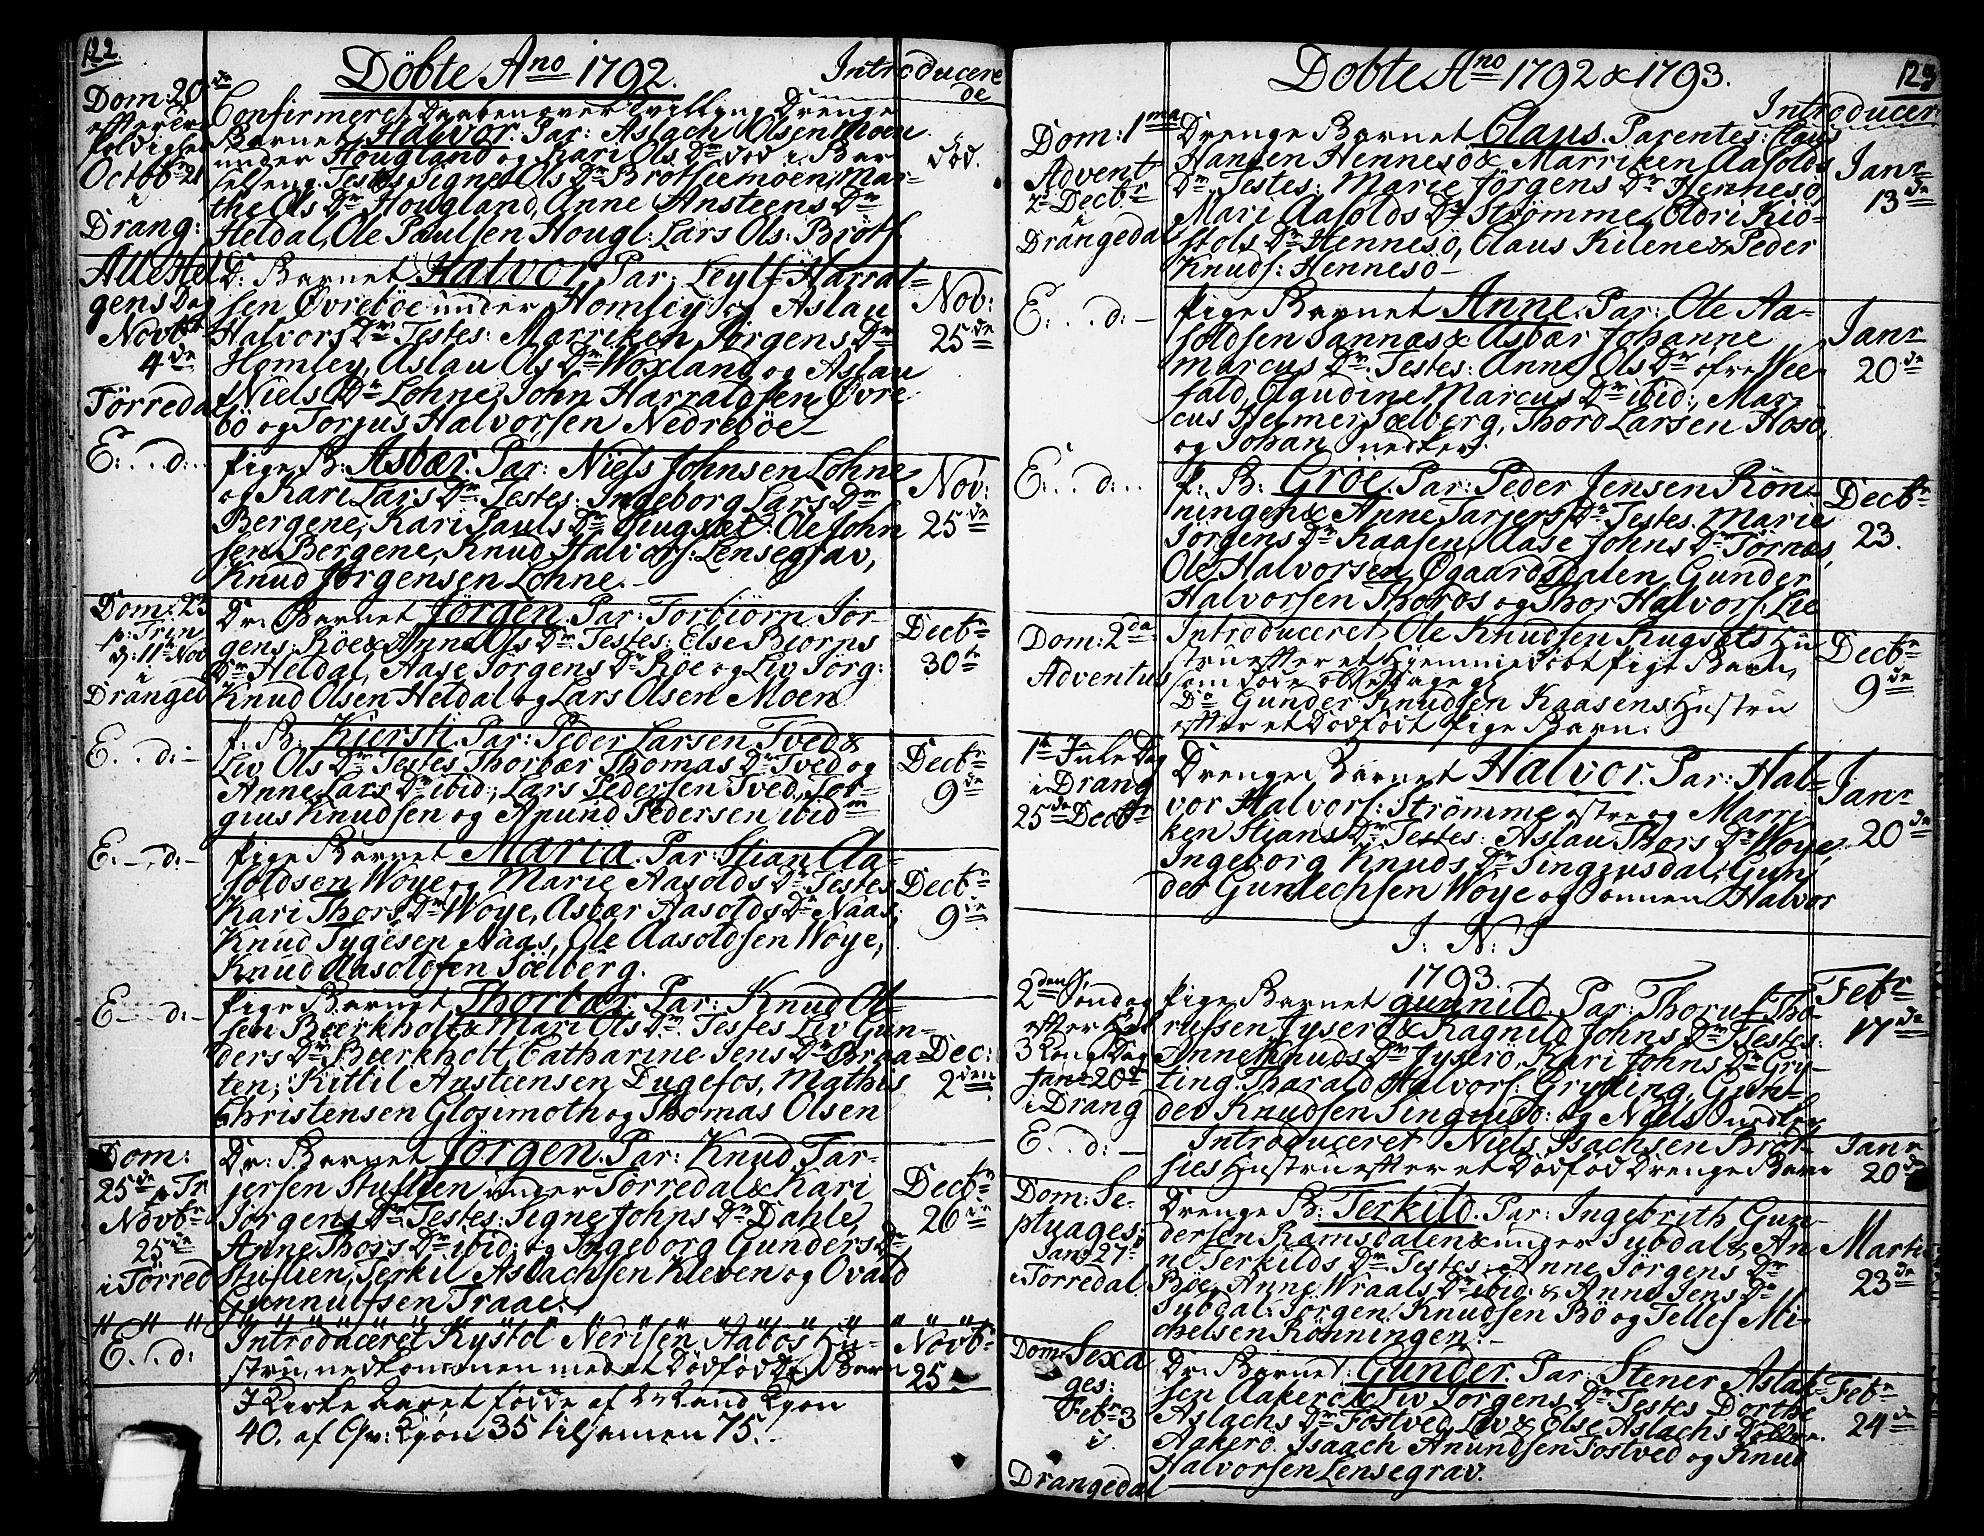 SAKO, Drangedal kirkebøker, F/Fa/L0003: Ministerialbok nr. 3, 1768-1814, s. 122-123